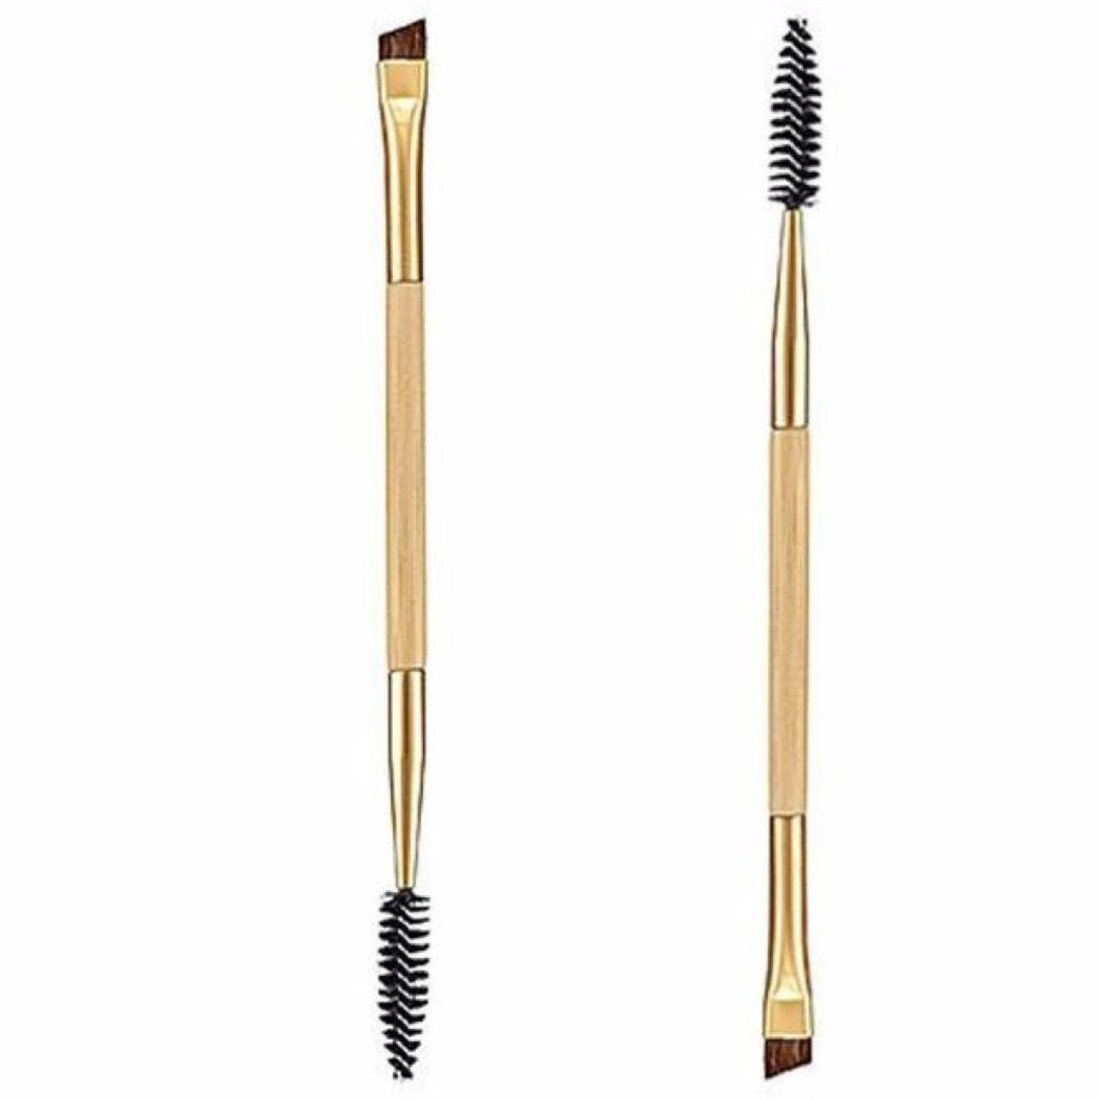 Make-up Pinsel, 2PCS Make-up Kunststoffe Griff Doppel Augenbrauen Pinsel + Augenbrauen Kamm Waymeduo